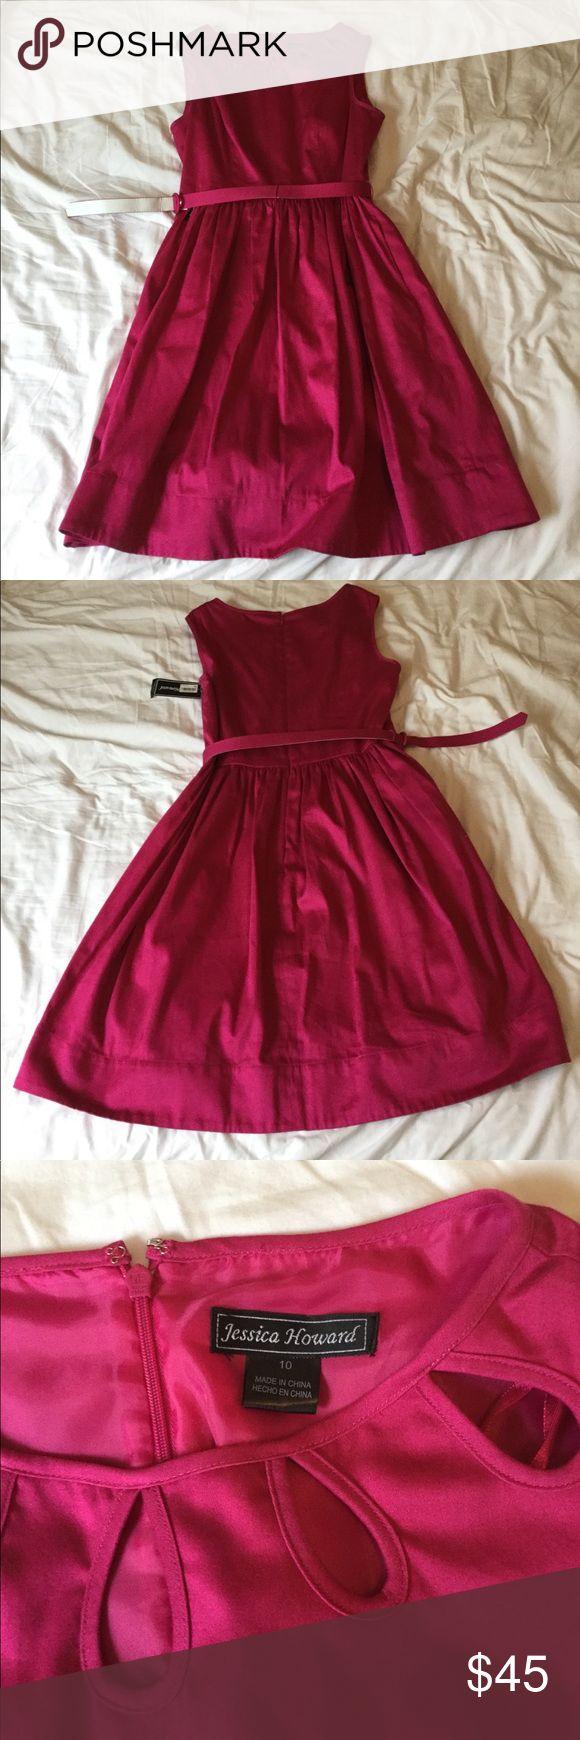 Jessica Howard Pink Dress Size 10 pink (Fuschia) Jessica Howard dress with belt. Has not been worn and still has the tag on it. Jessica Howard Dresses